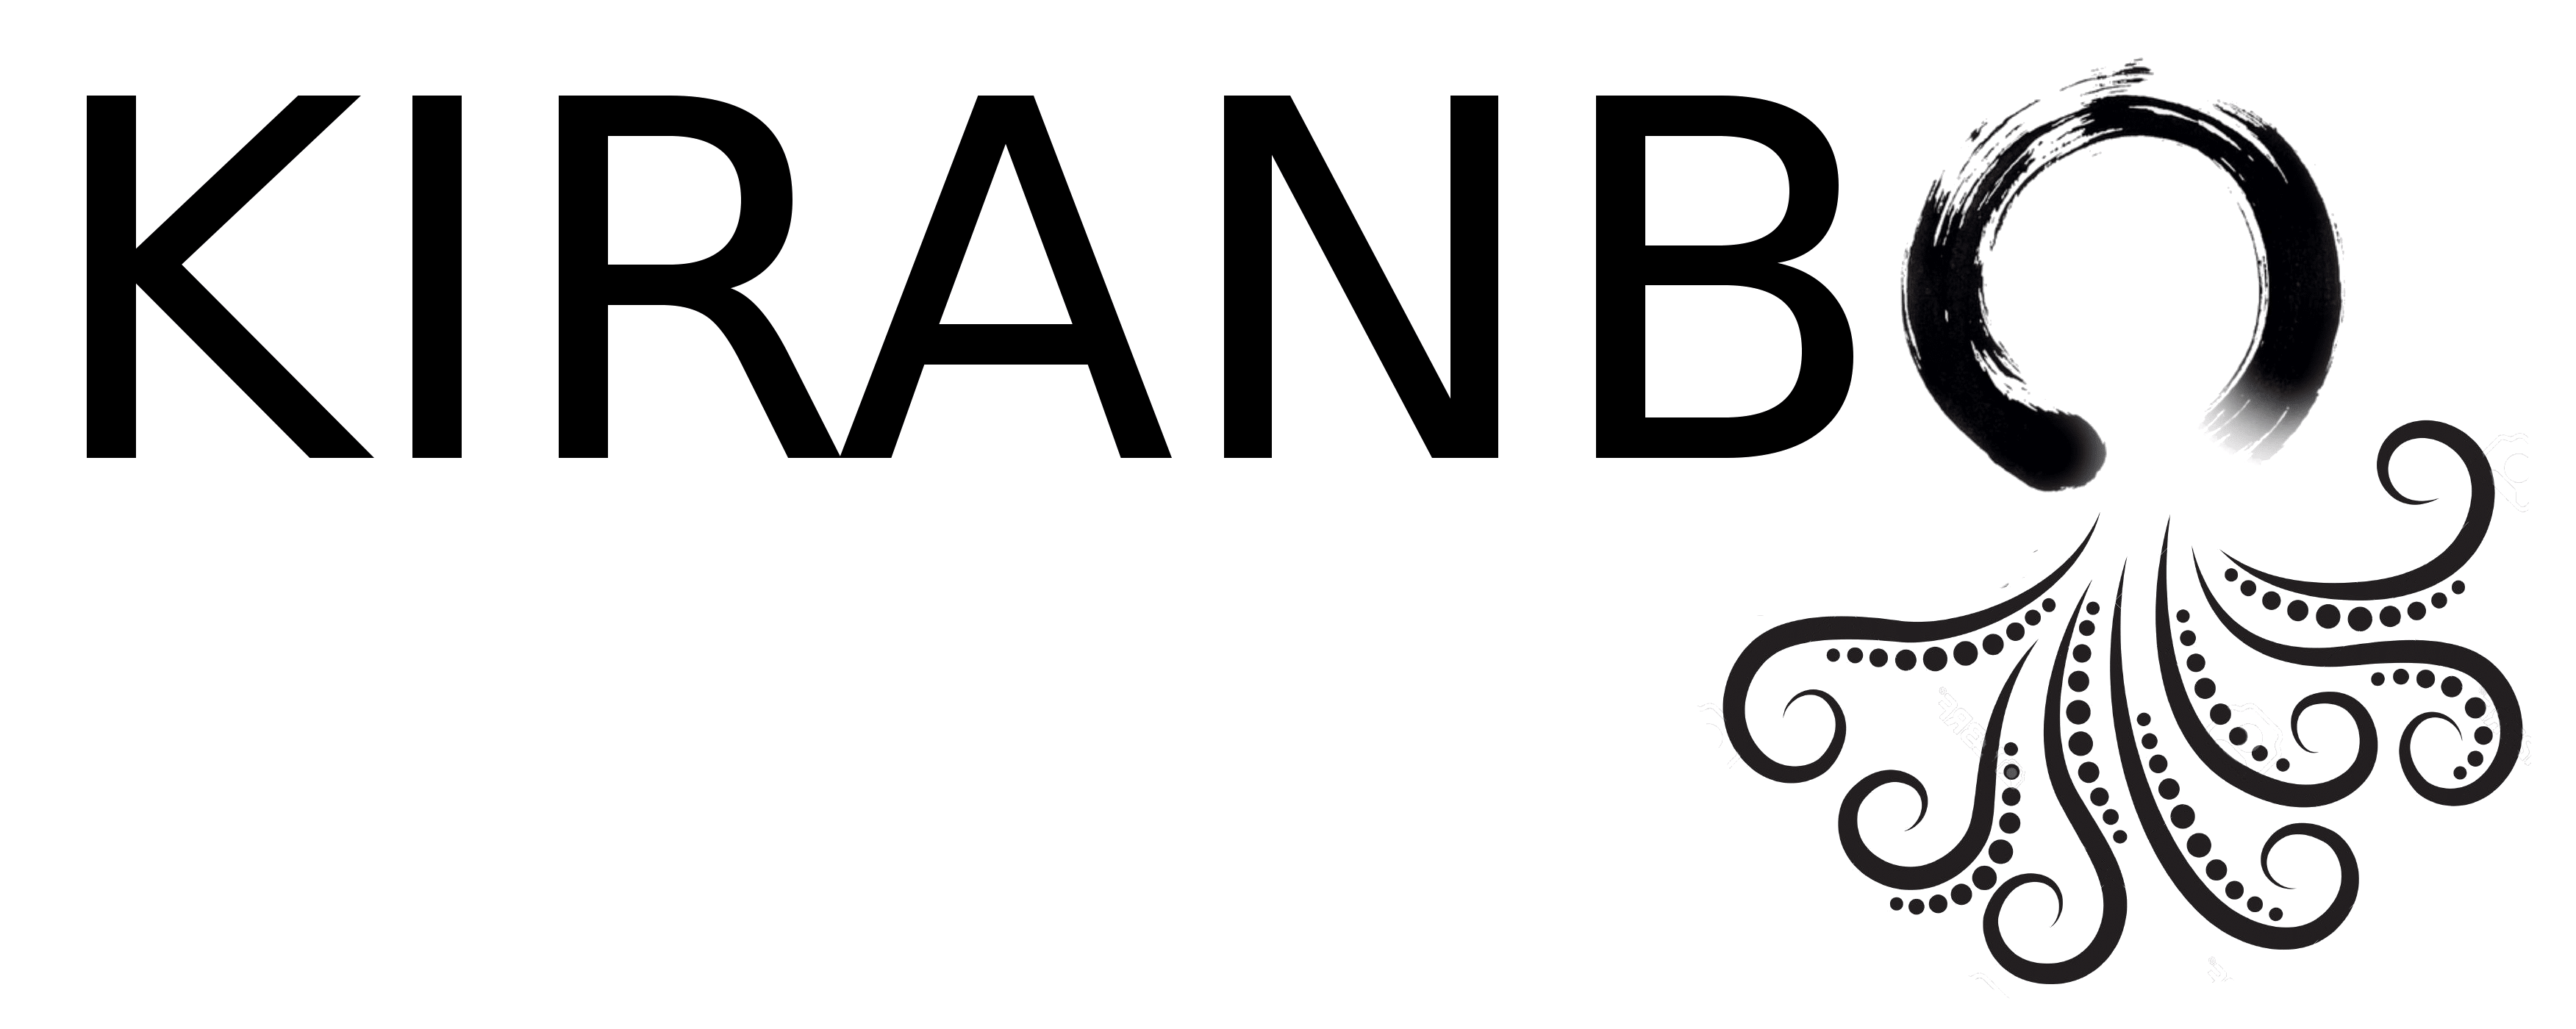 Kiranbo Logo